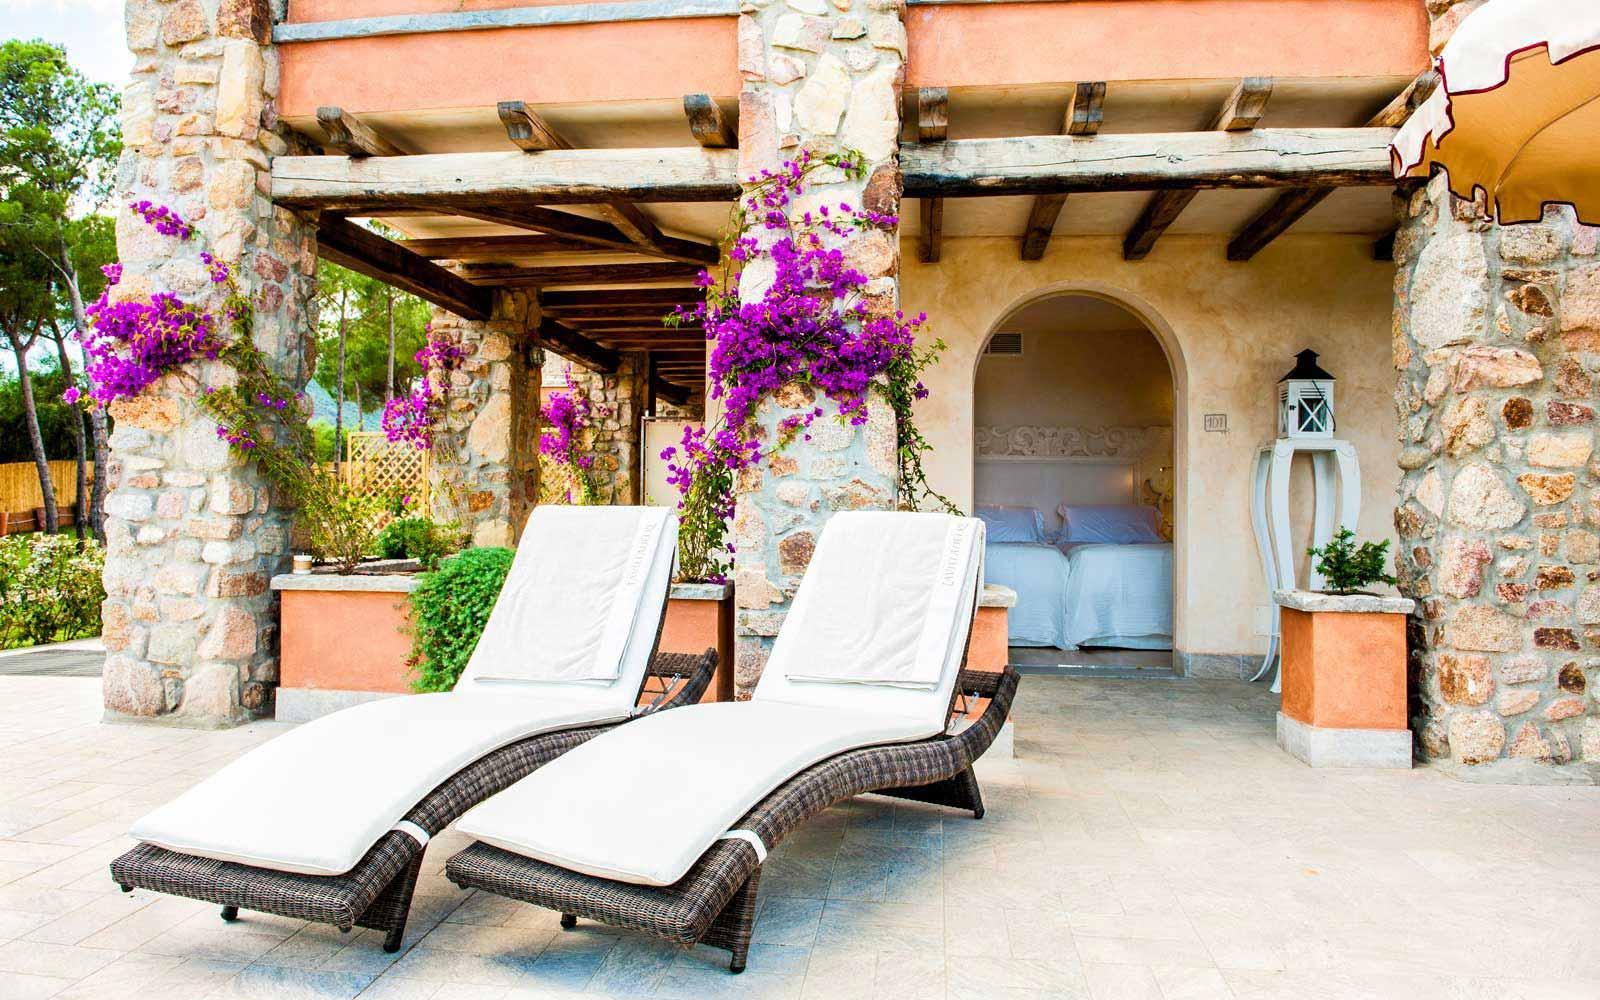 Relax at the Hotel Villa del Re